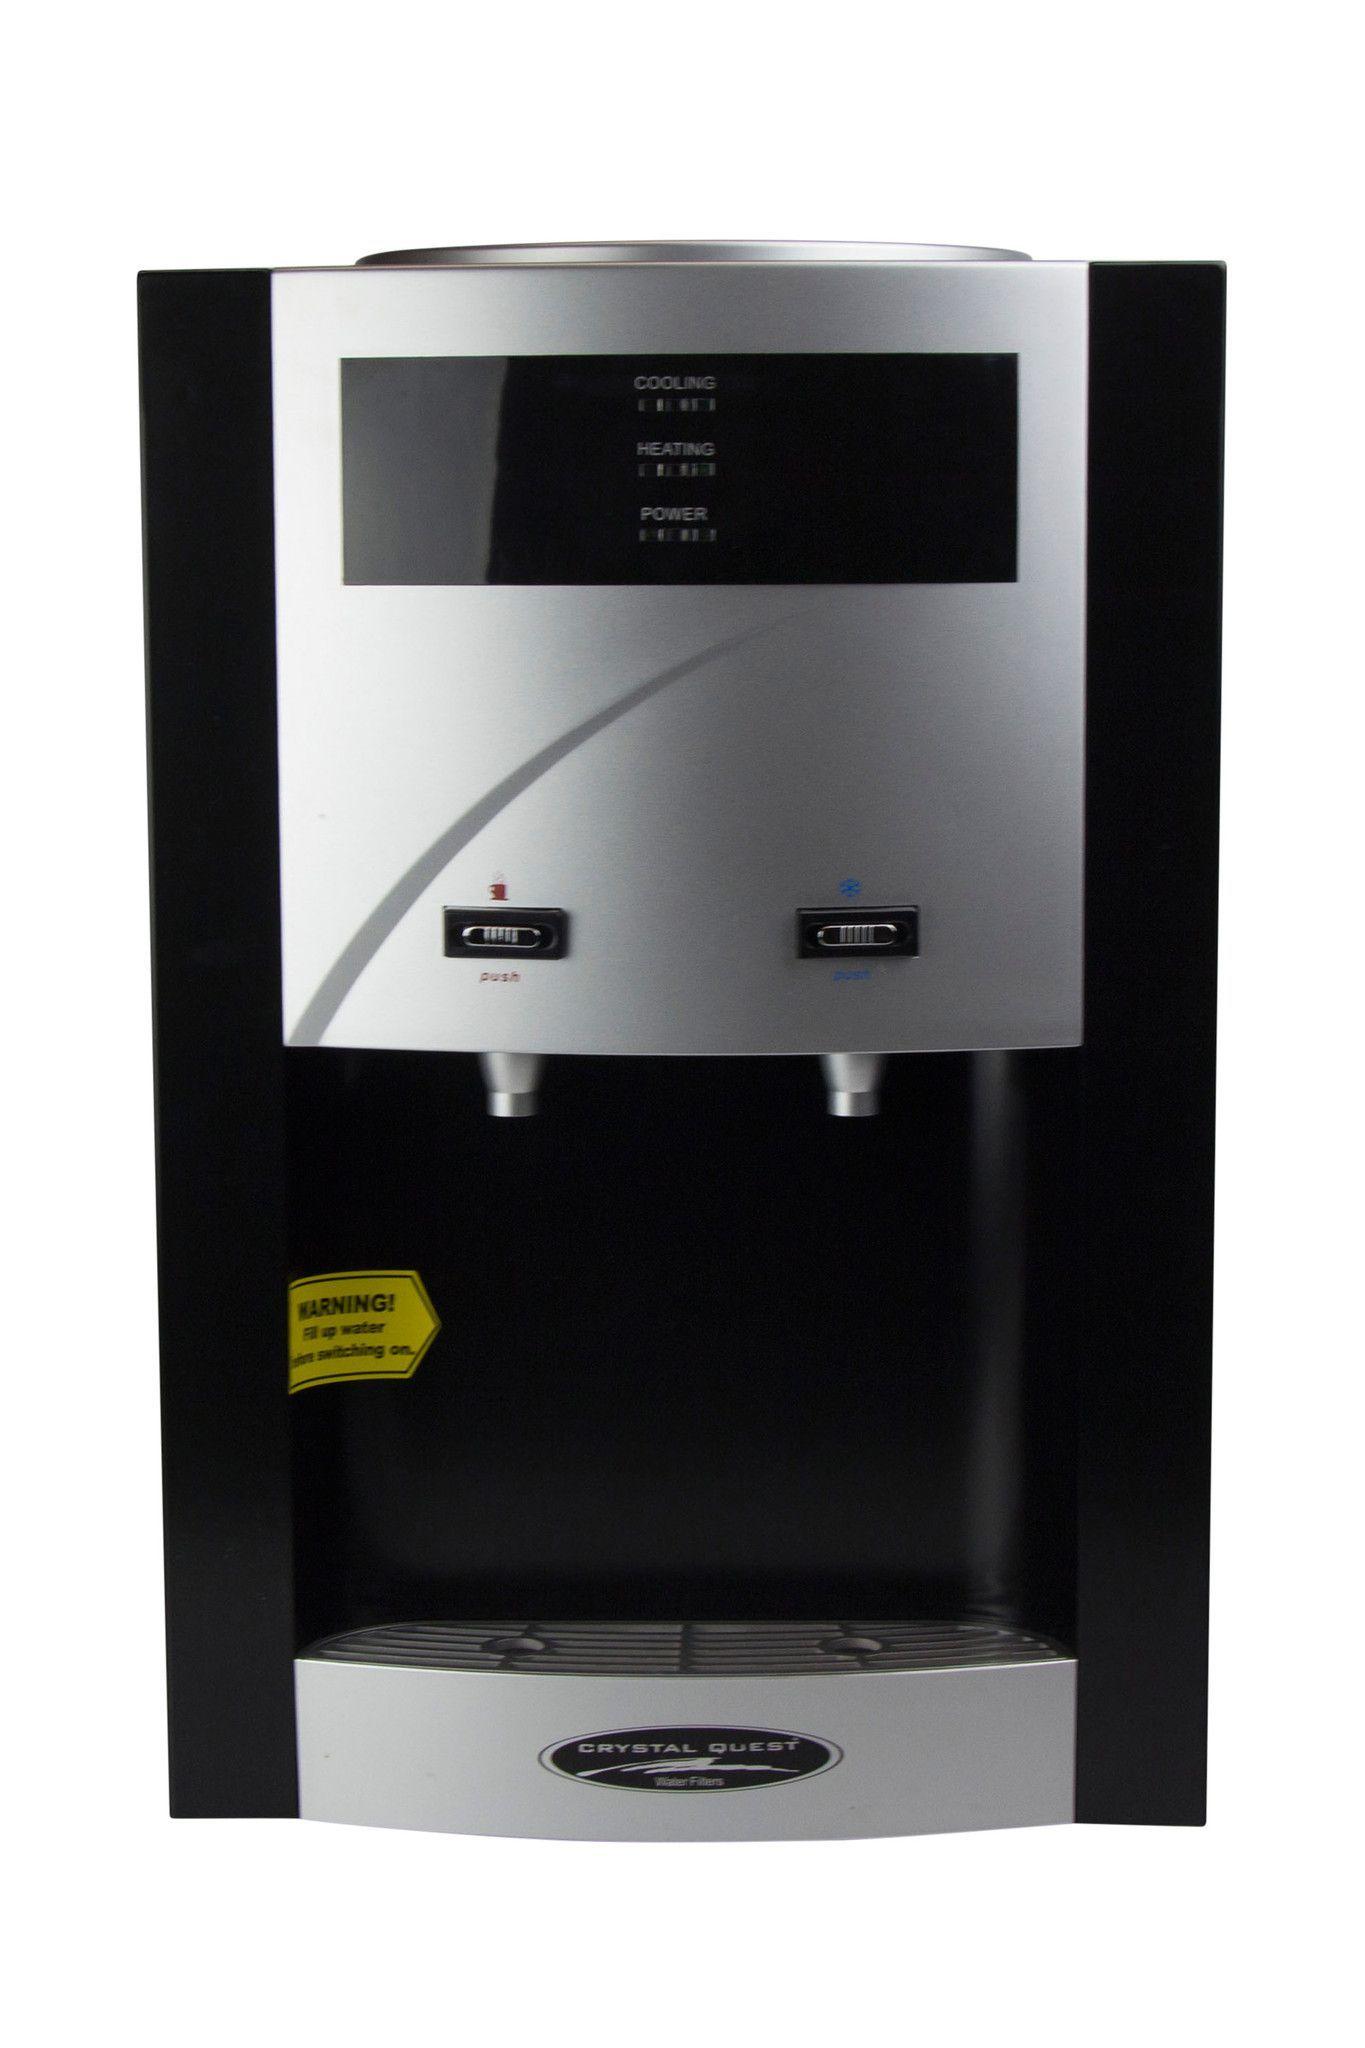 TURBO Countertop Bottleless Water Cooler